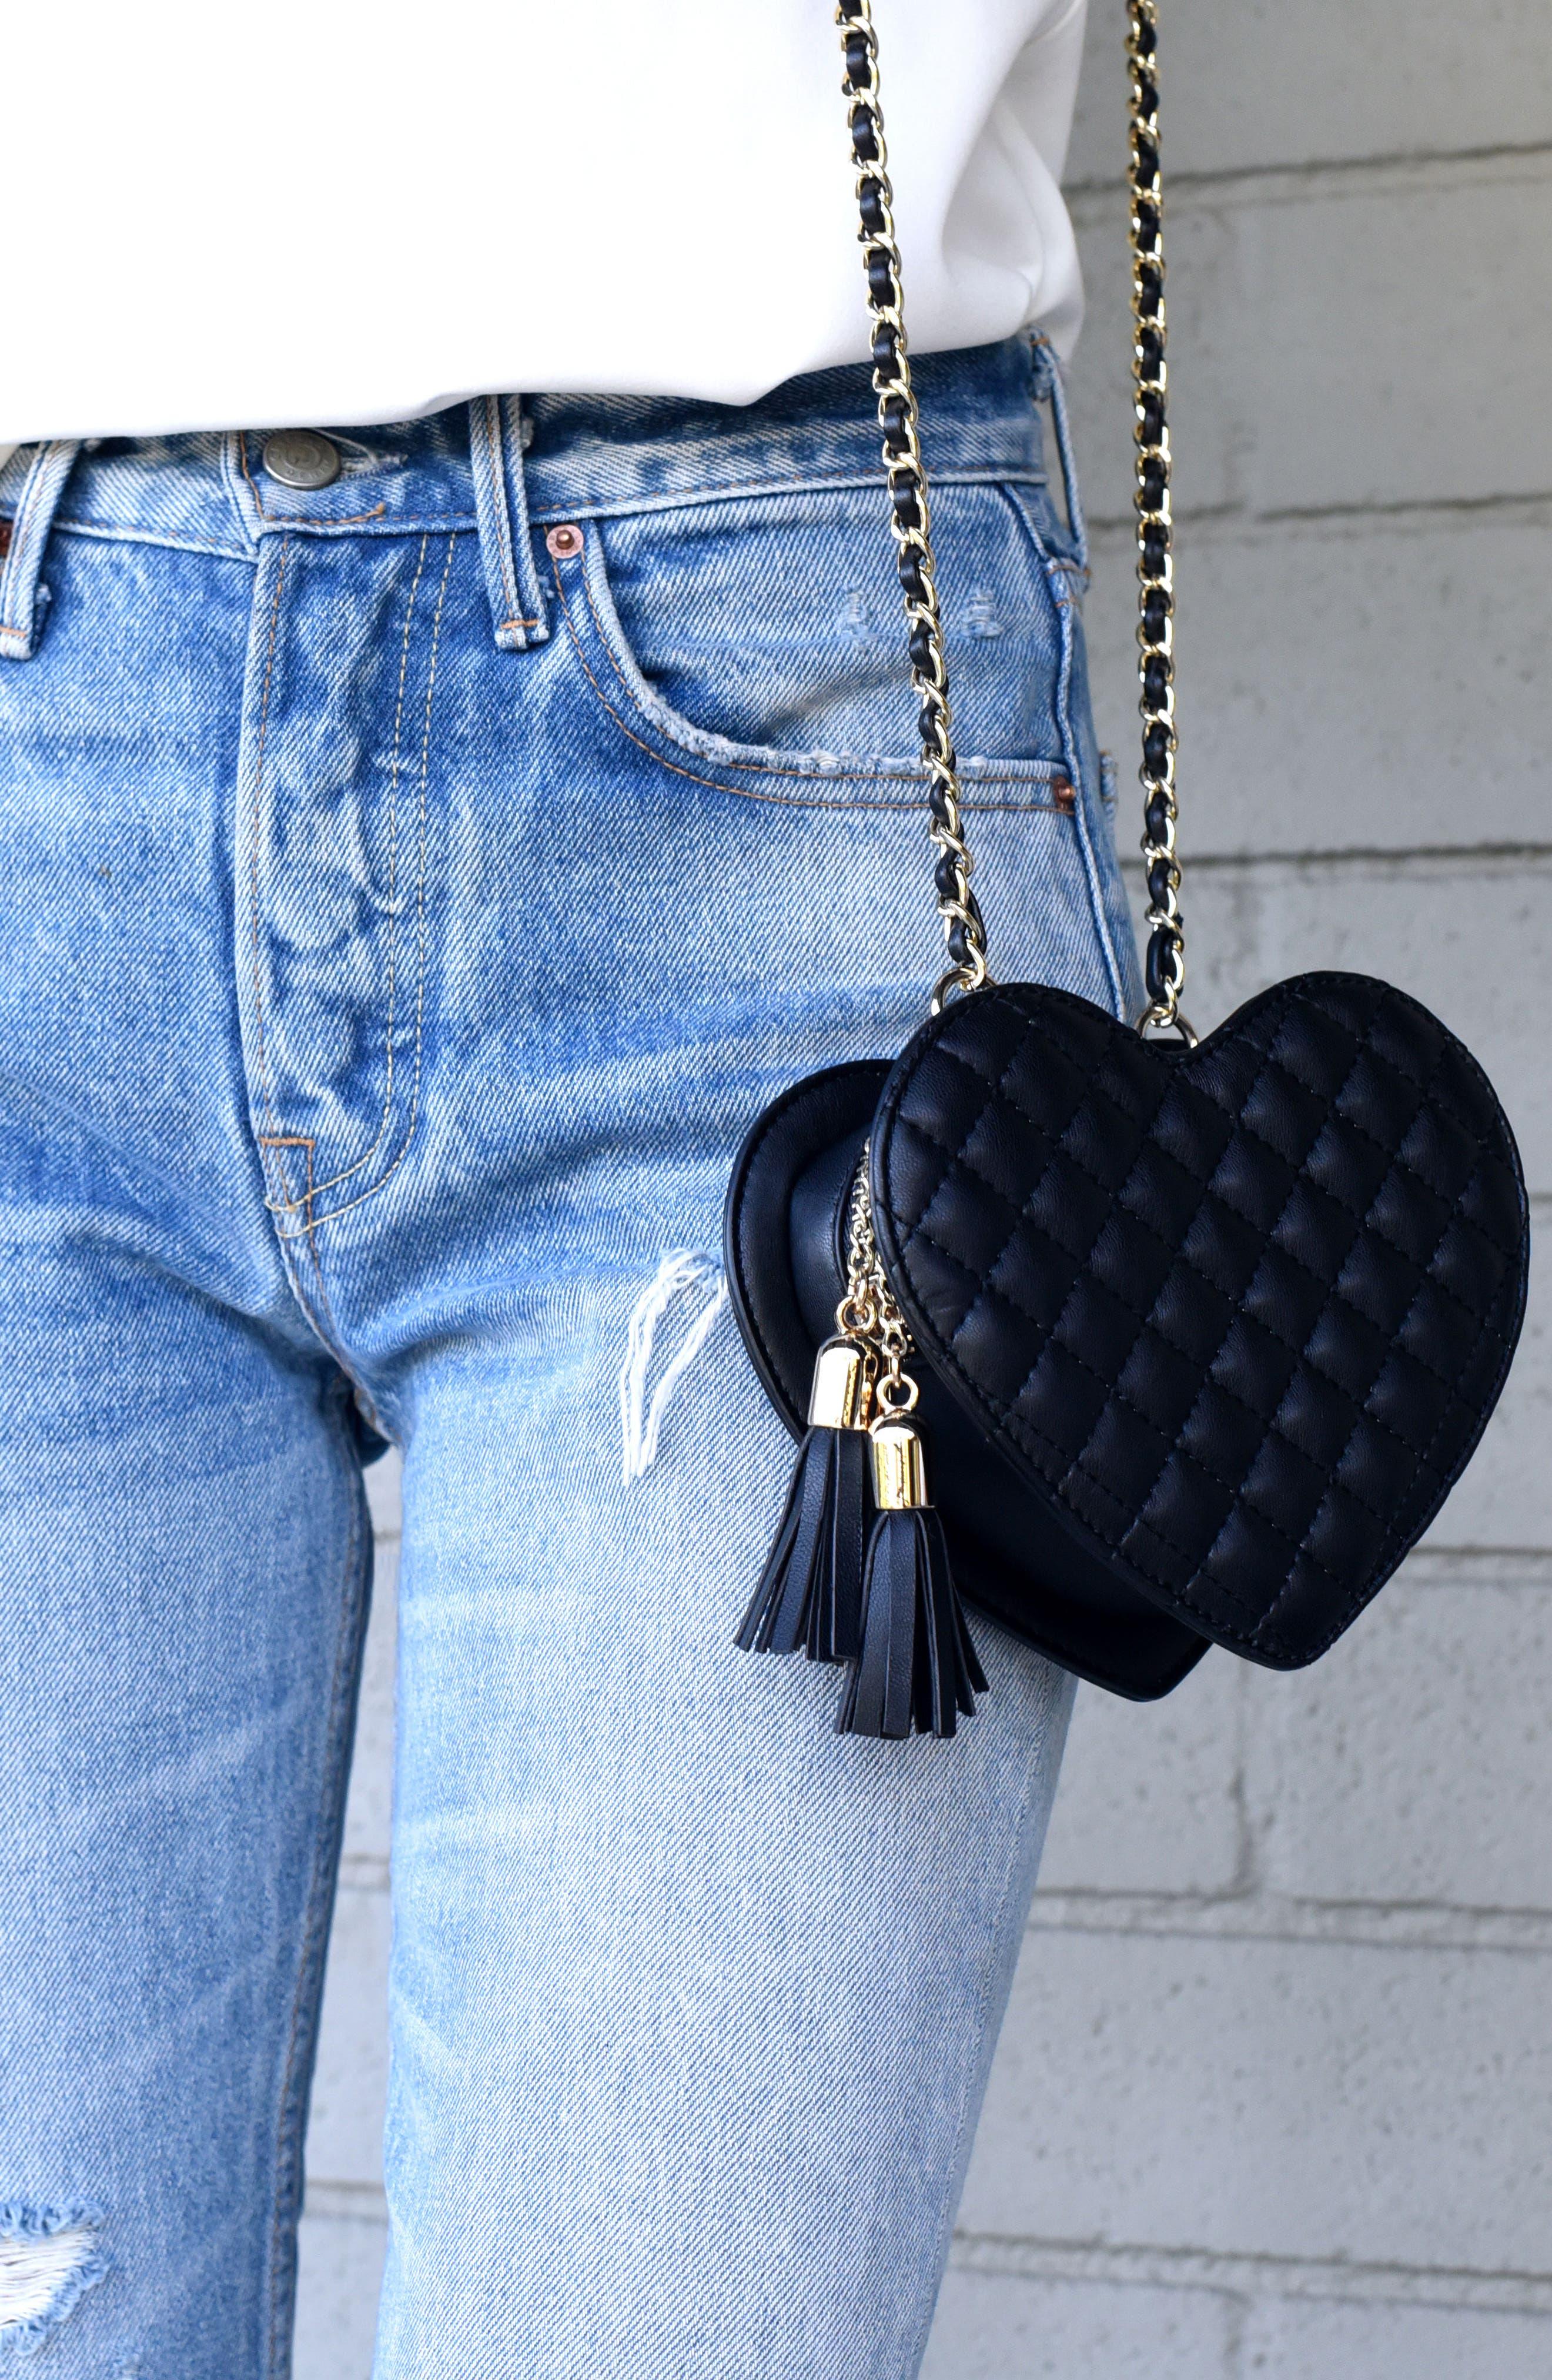 Mali + Lili Quilted Heart Vegan Leather Crossbody Bag,                             Alternate thumbnail 7, color,                             Black